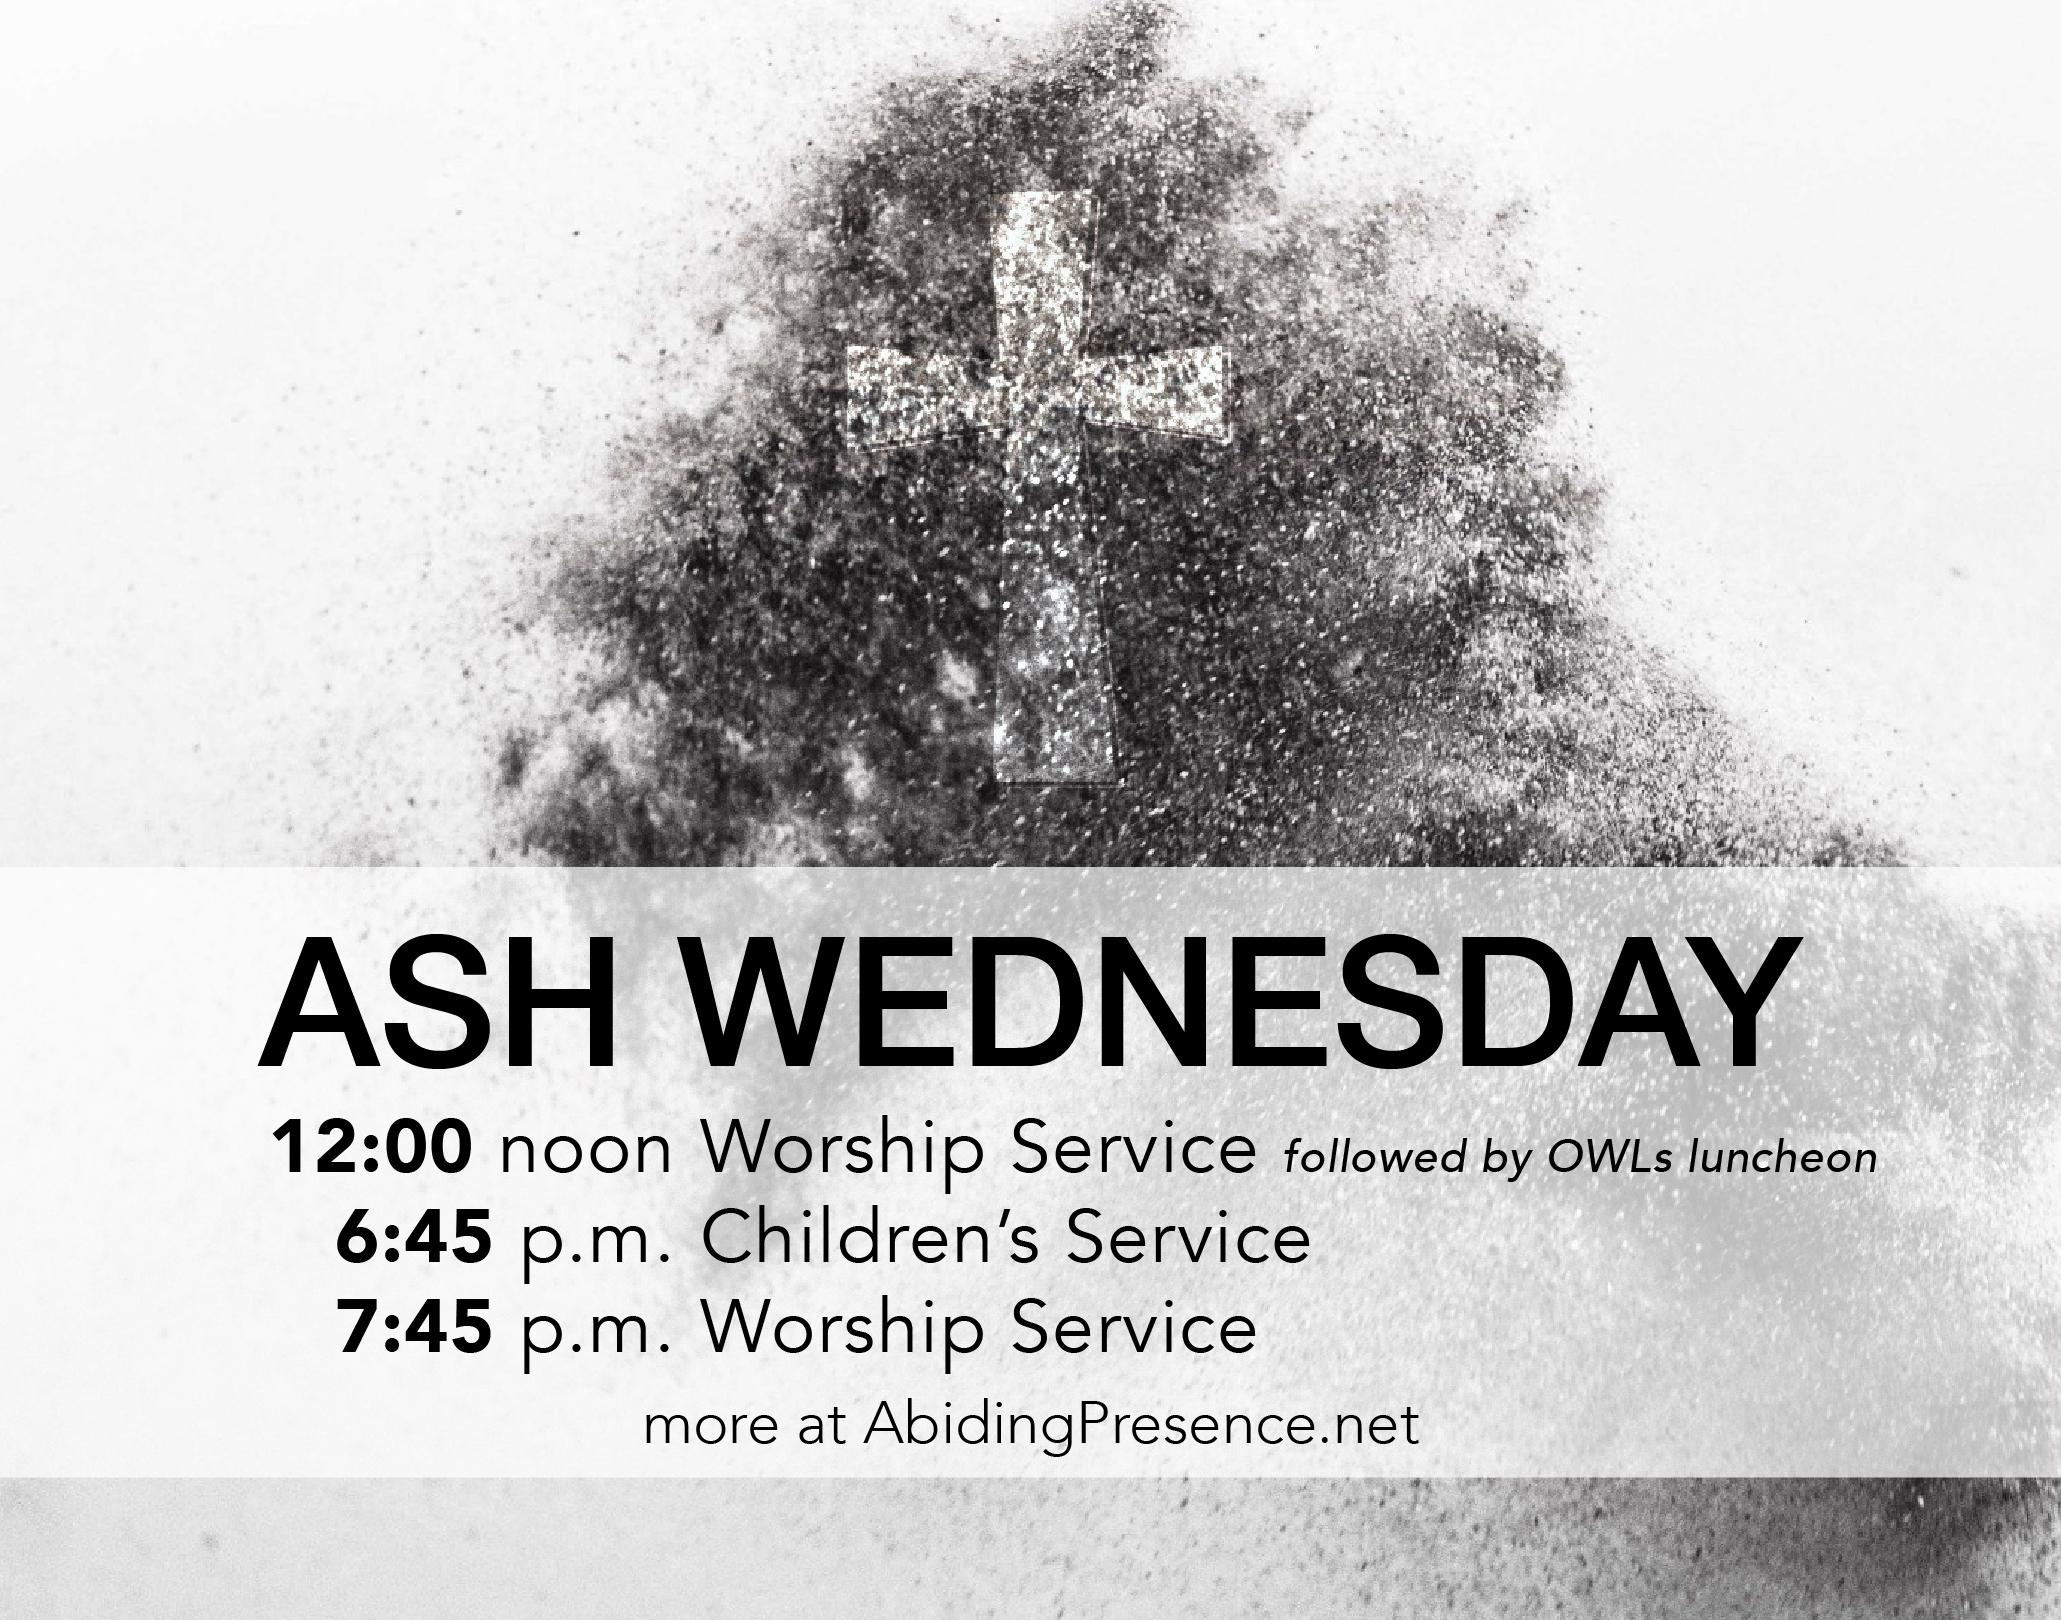 Ash Wednesday 2019 schedule less wide v1.jpg